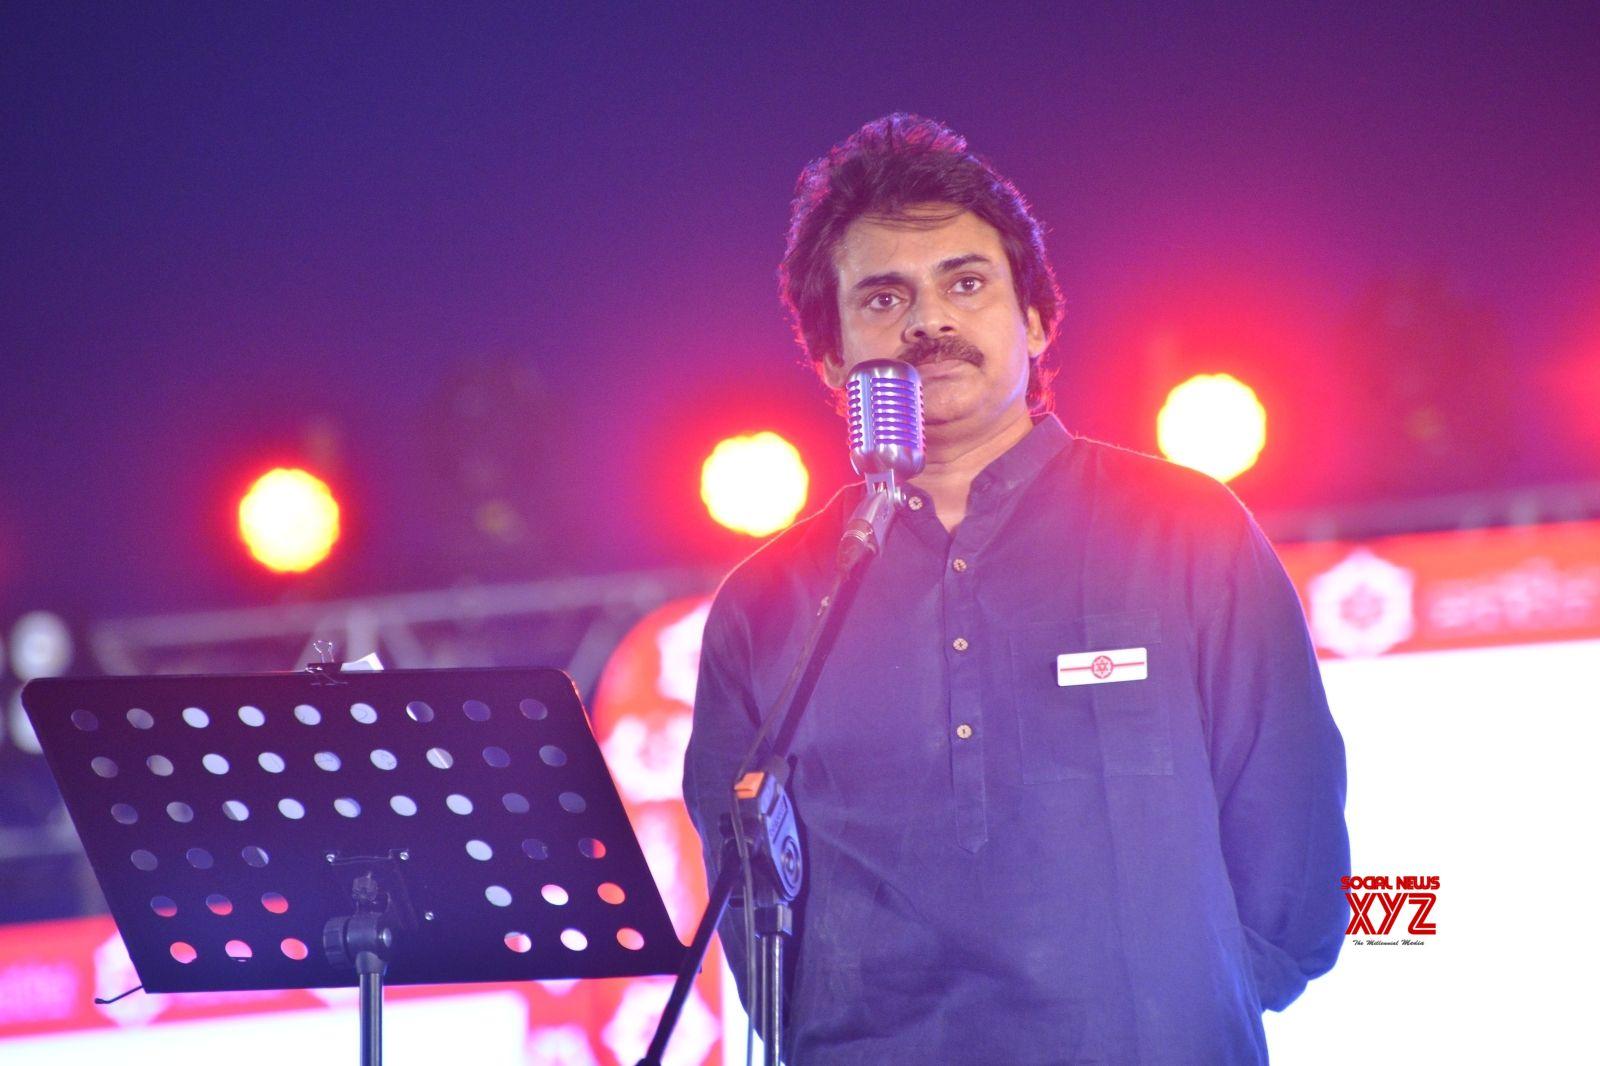 Hyderabad: Actor Pawan Kalyan during a programme in Hyderabad. (Photo: IANS)